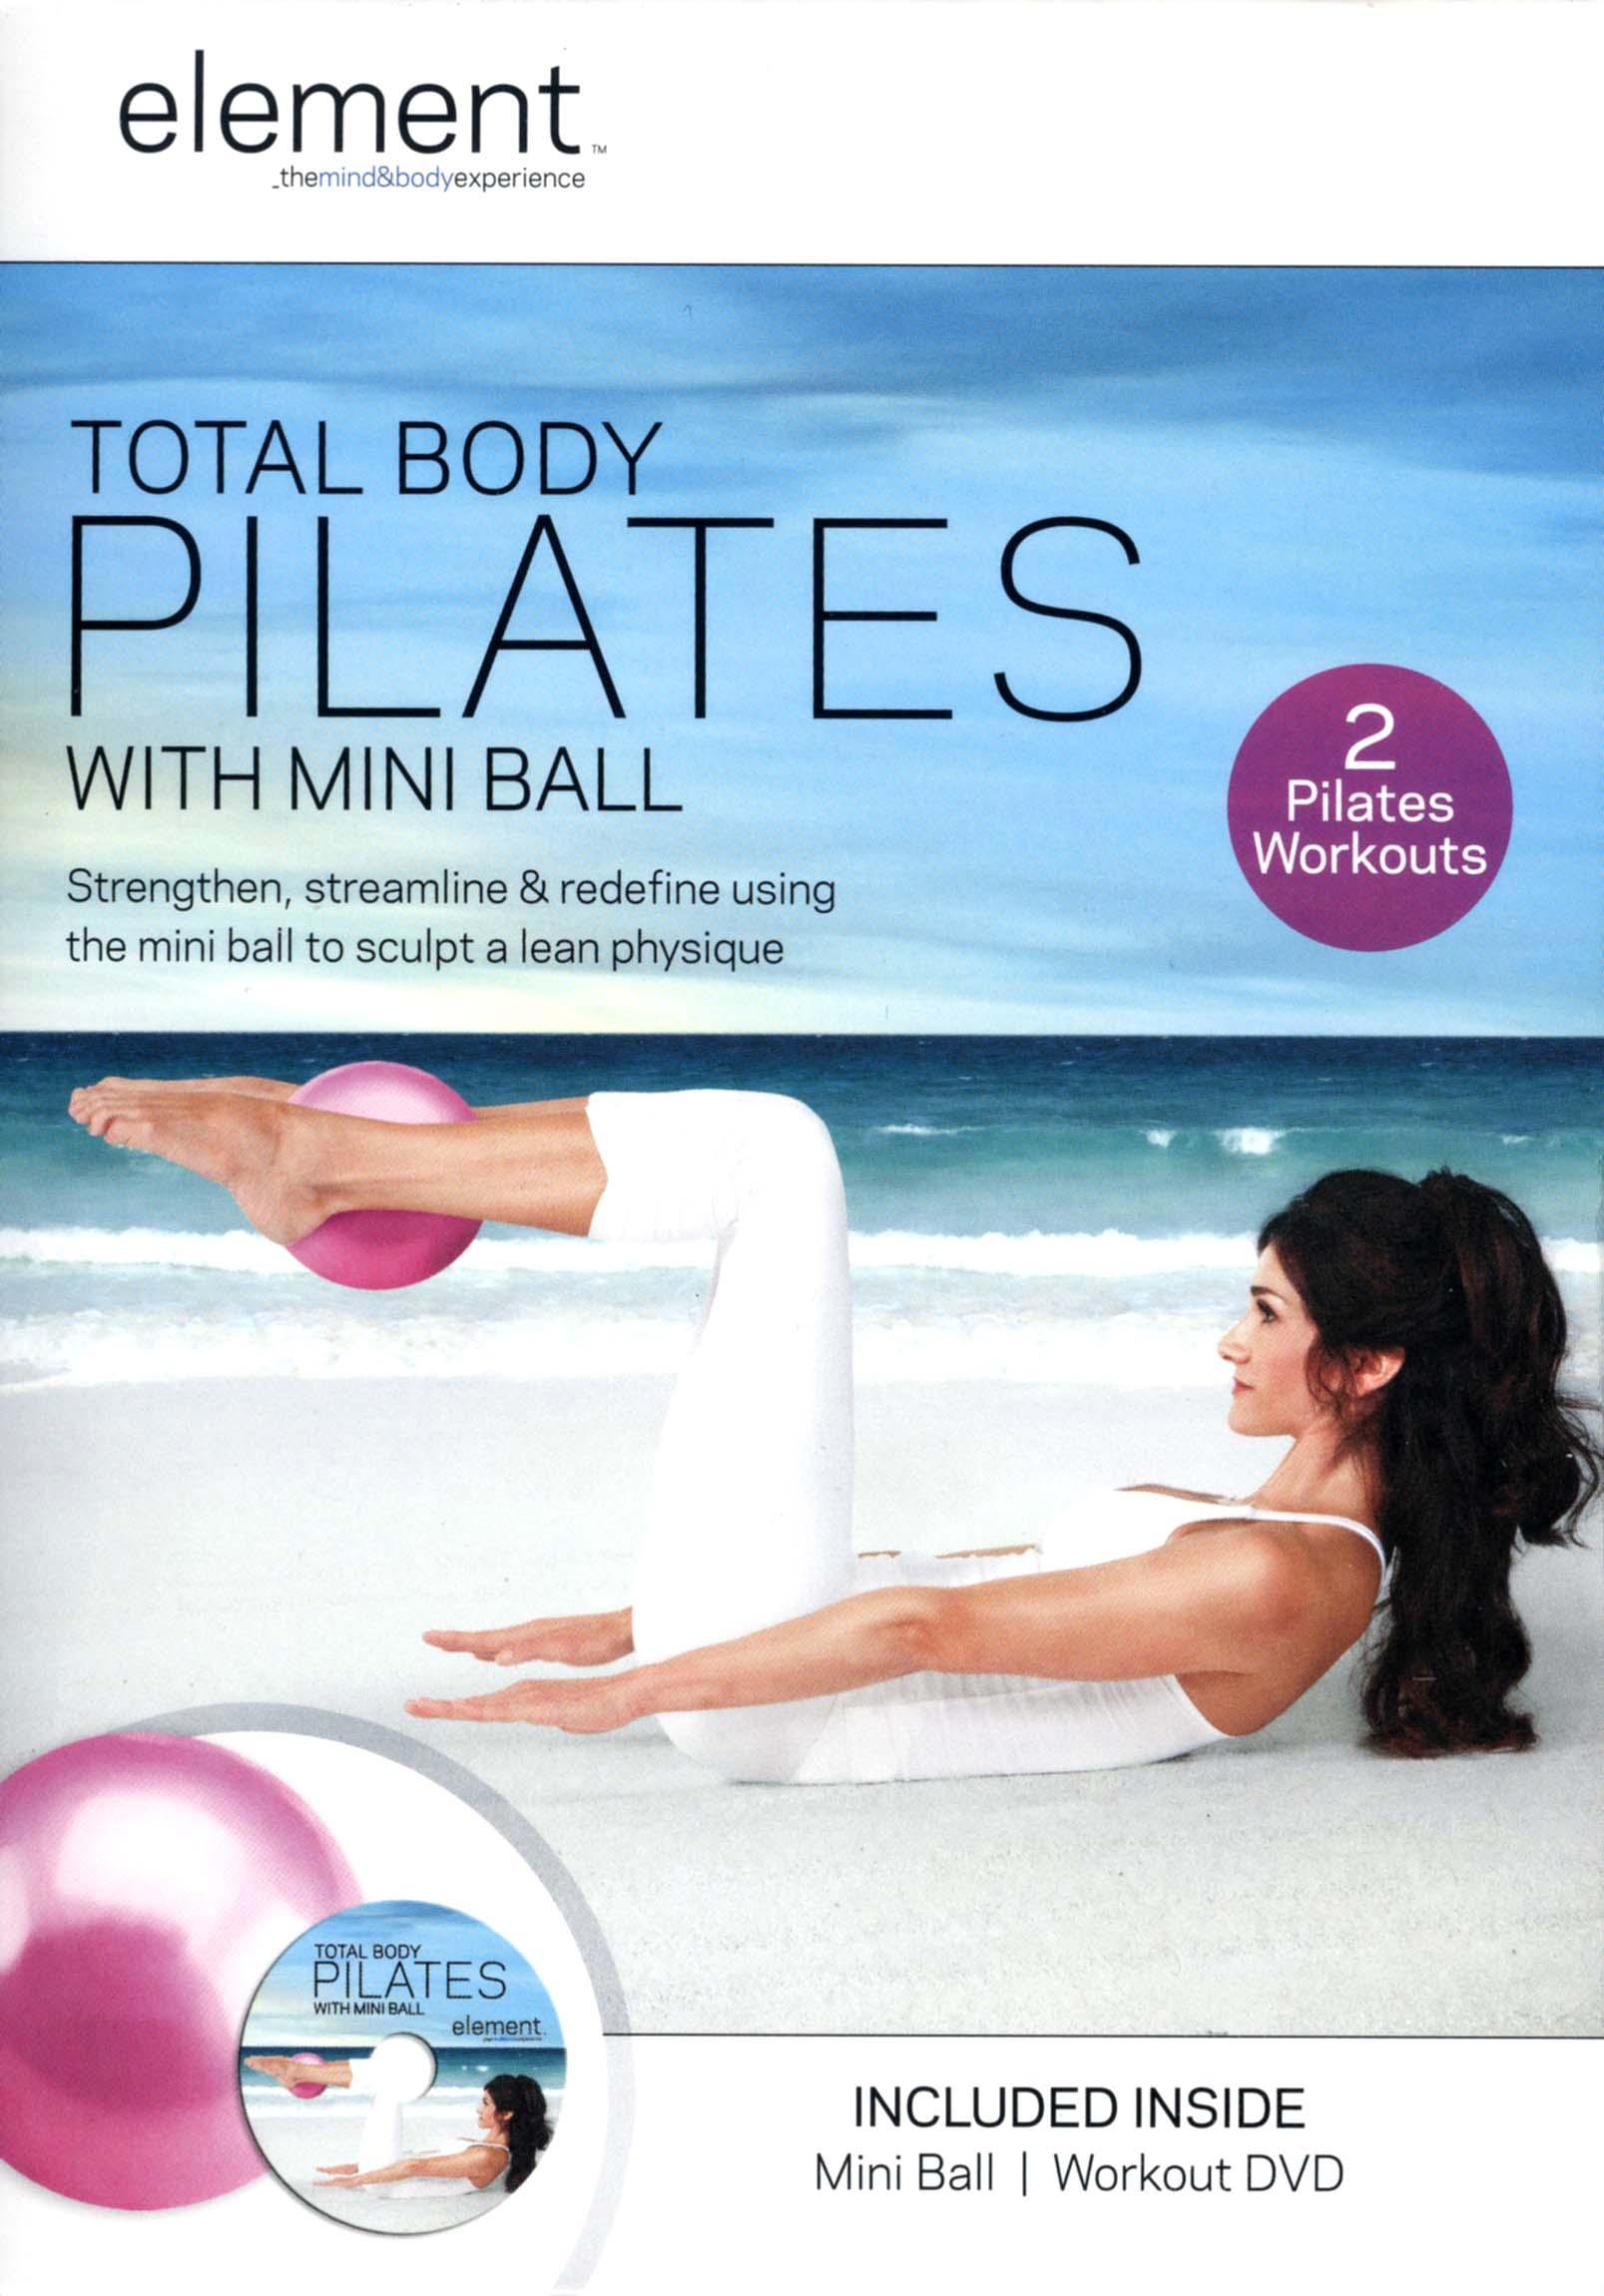 Element: Total Body Pilates